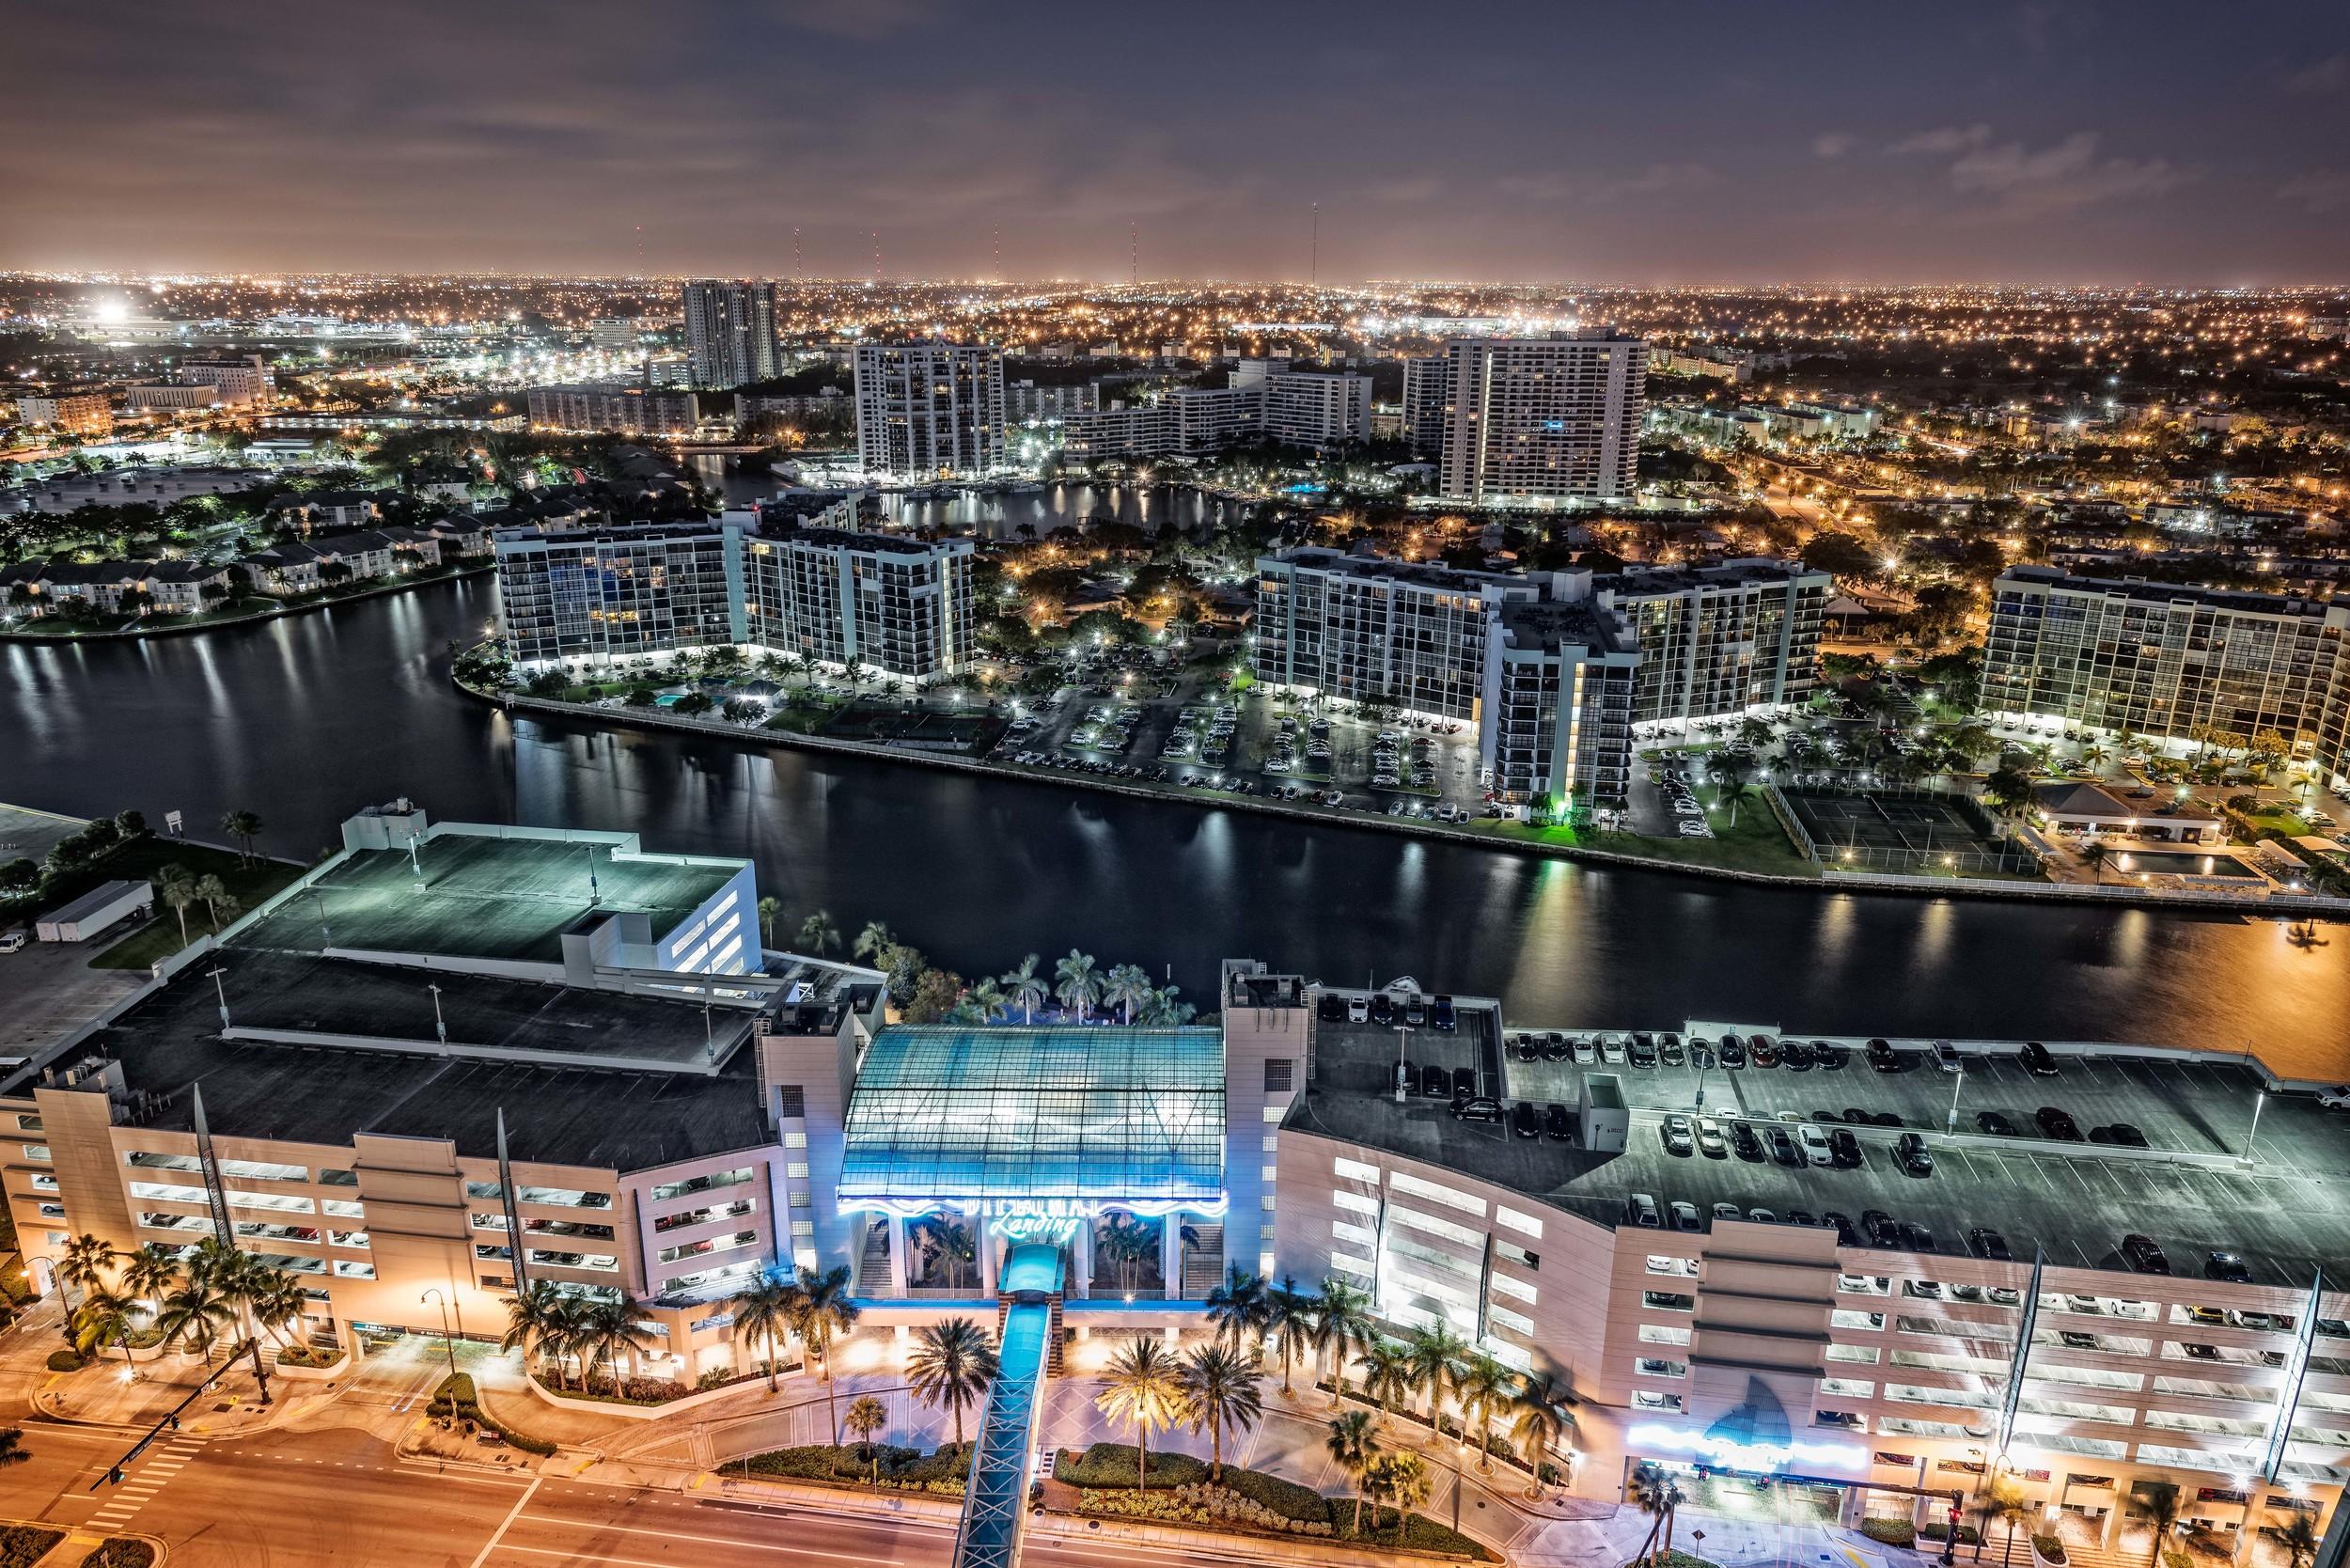 Twilight Shot of Miami, Florida